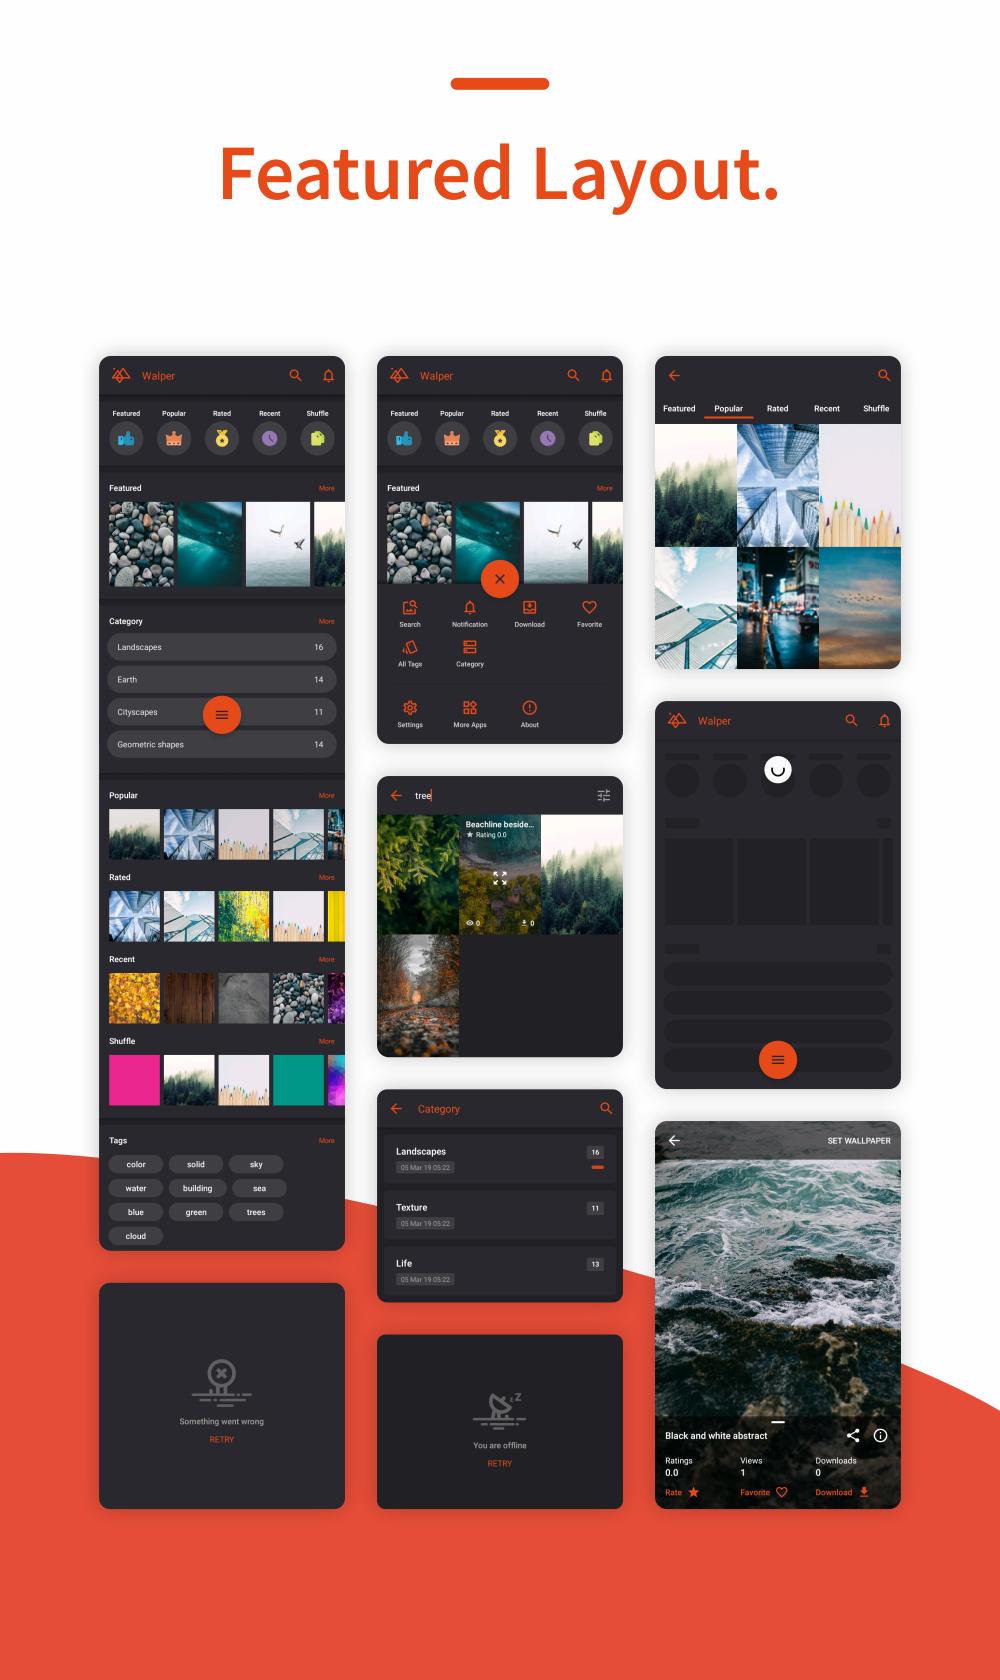 Walper - Wallpaper Android Application 1.0 - 3